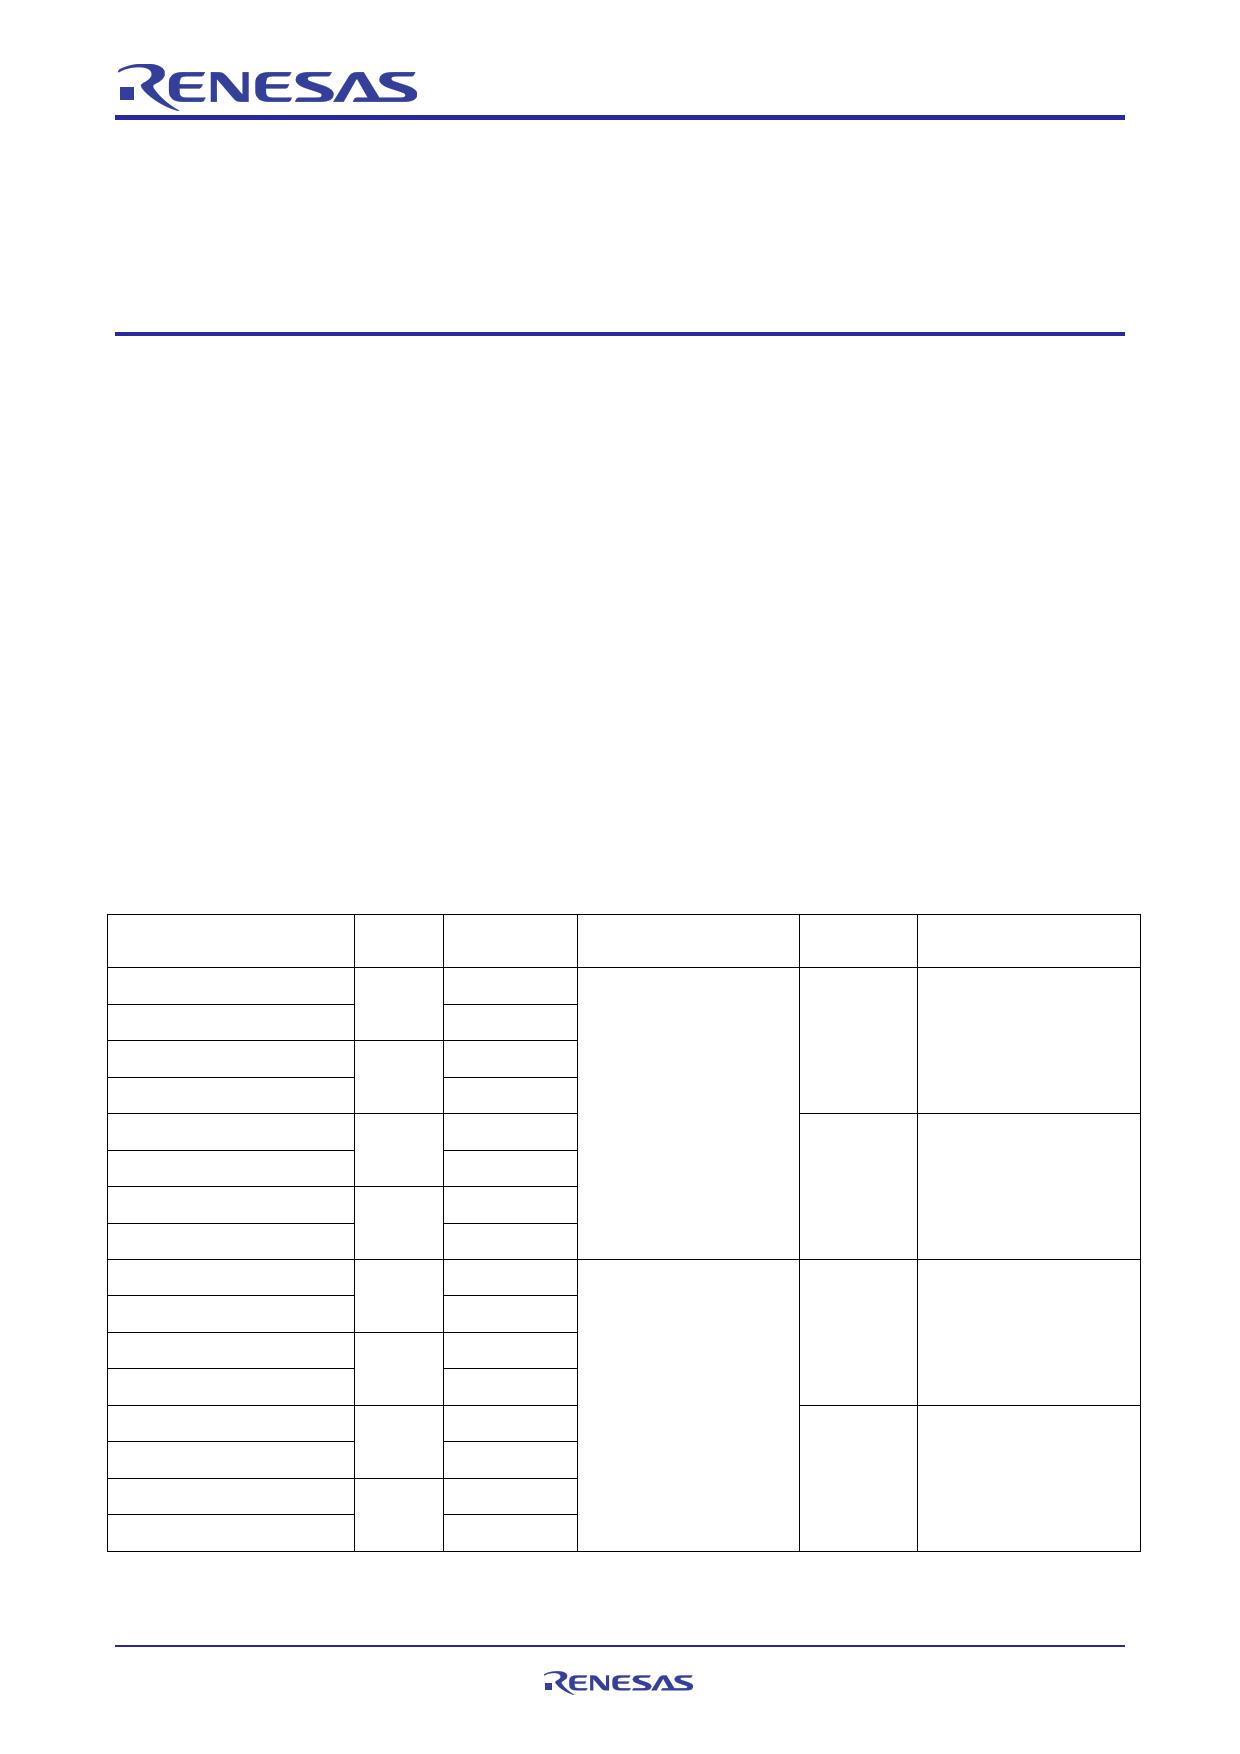 R1LV5256E datasheet